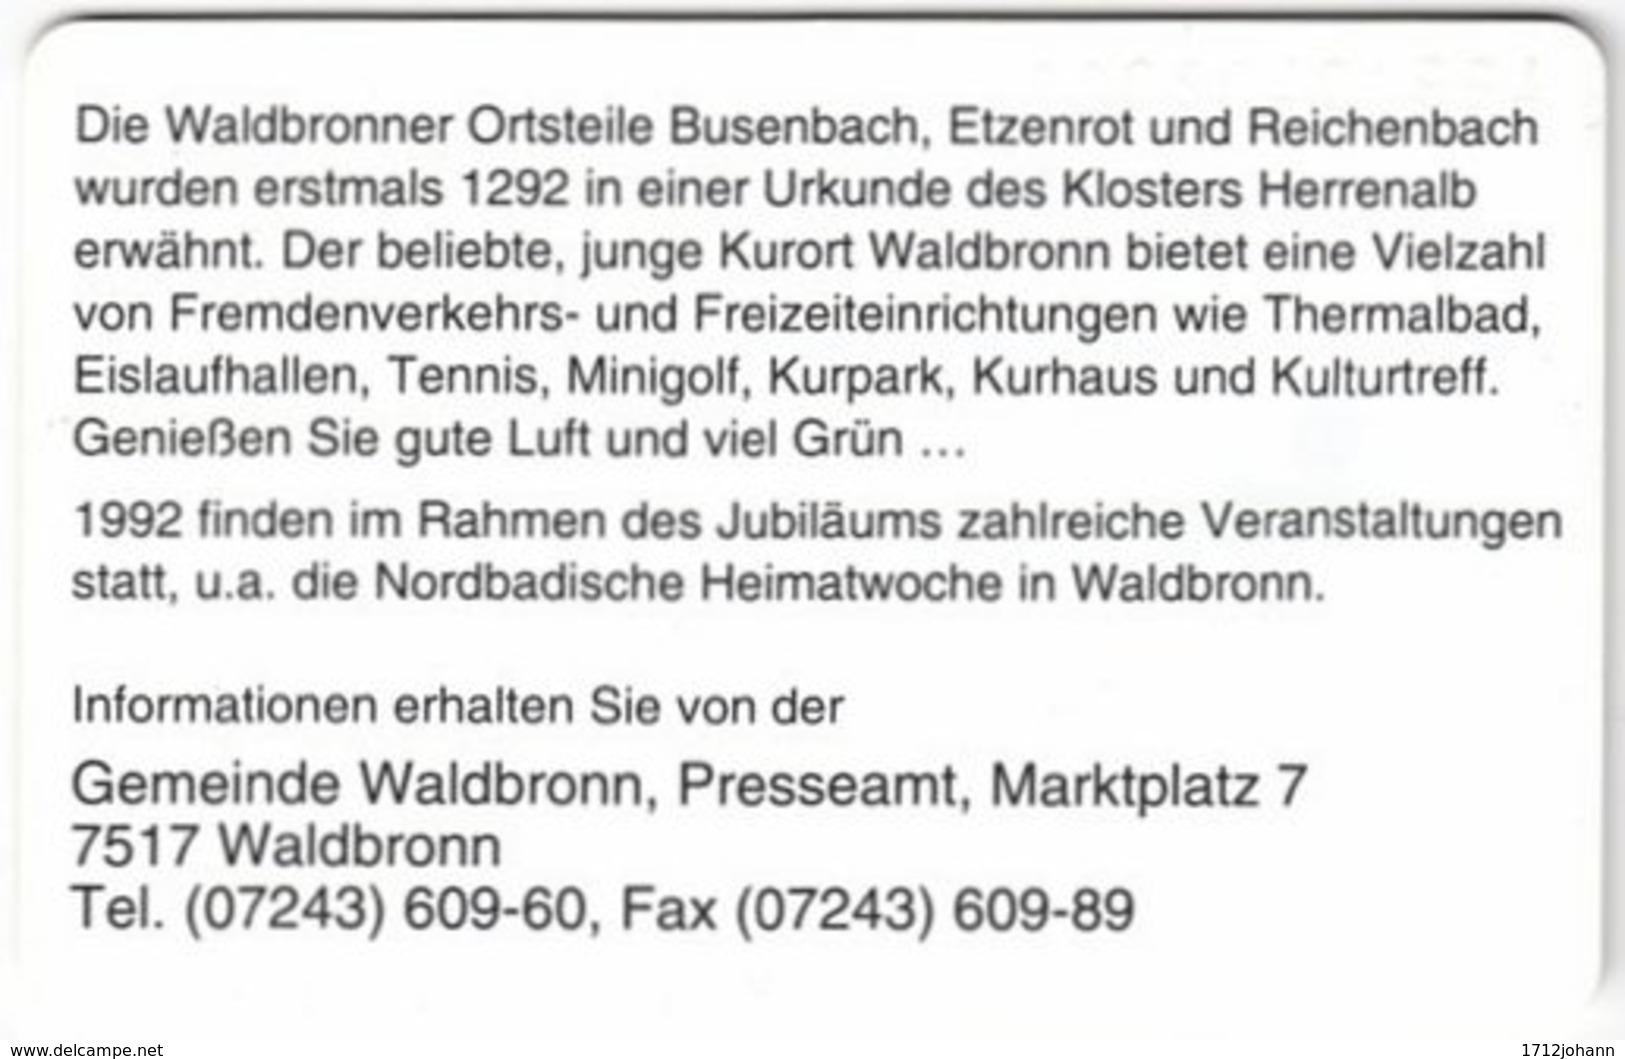 GERMANY O-Serie A-973 - 048 04.92 - MINT - Deutschland